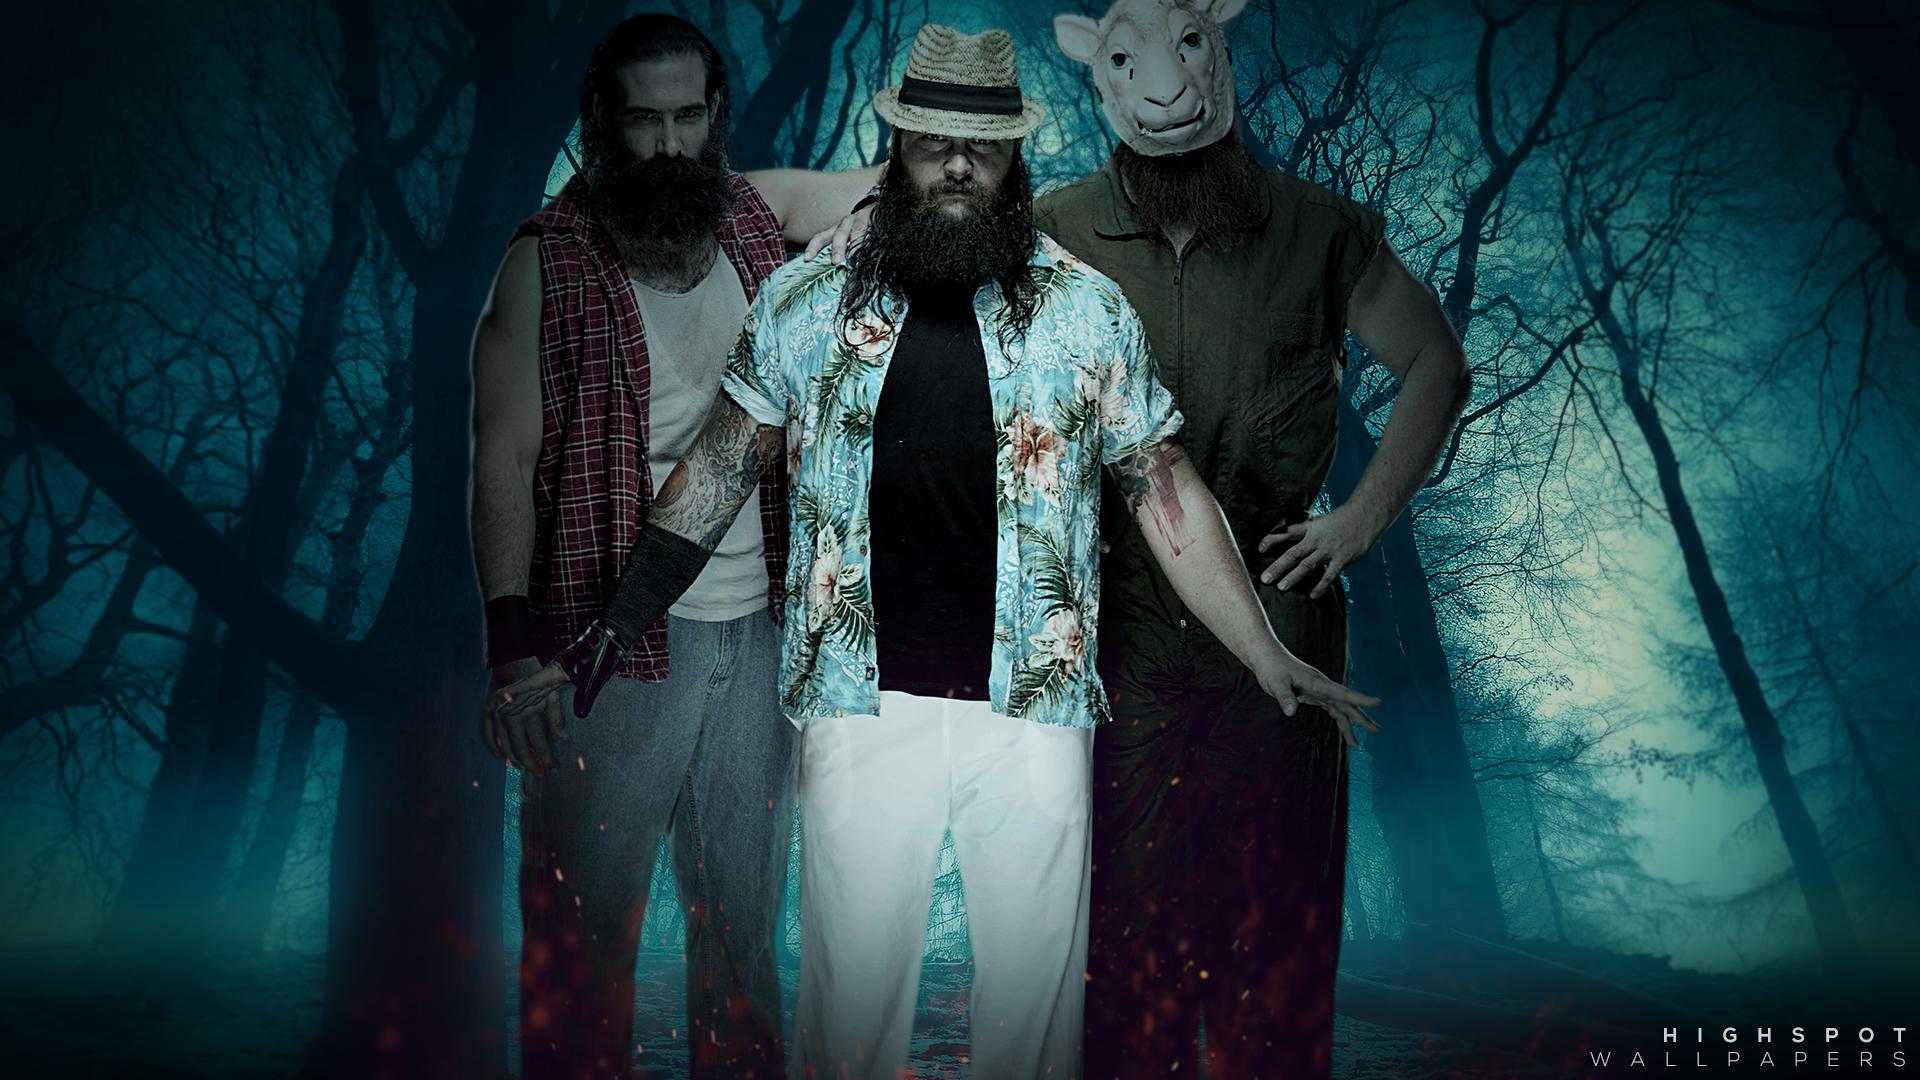 Sasha Banks Wallpaper Iphone The Wyatt Family Wallpaper Highspot Wrestling Wallpapers